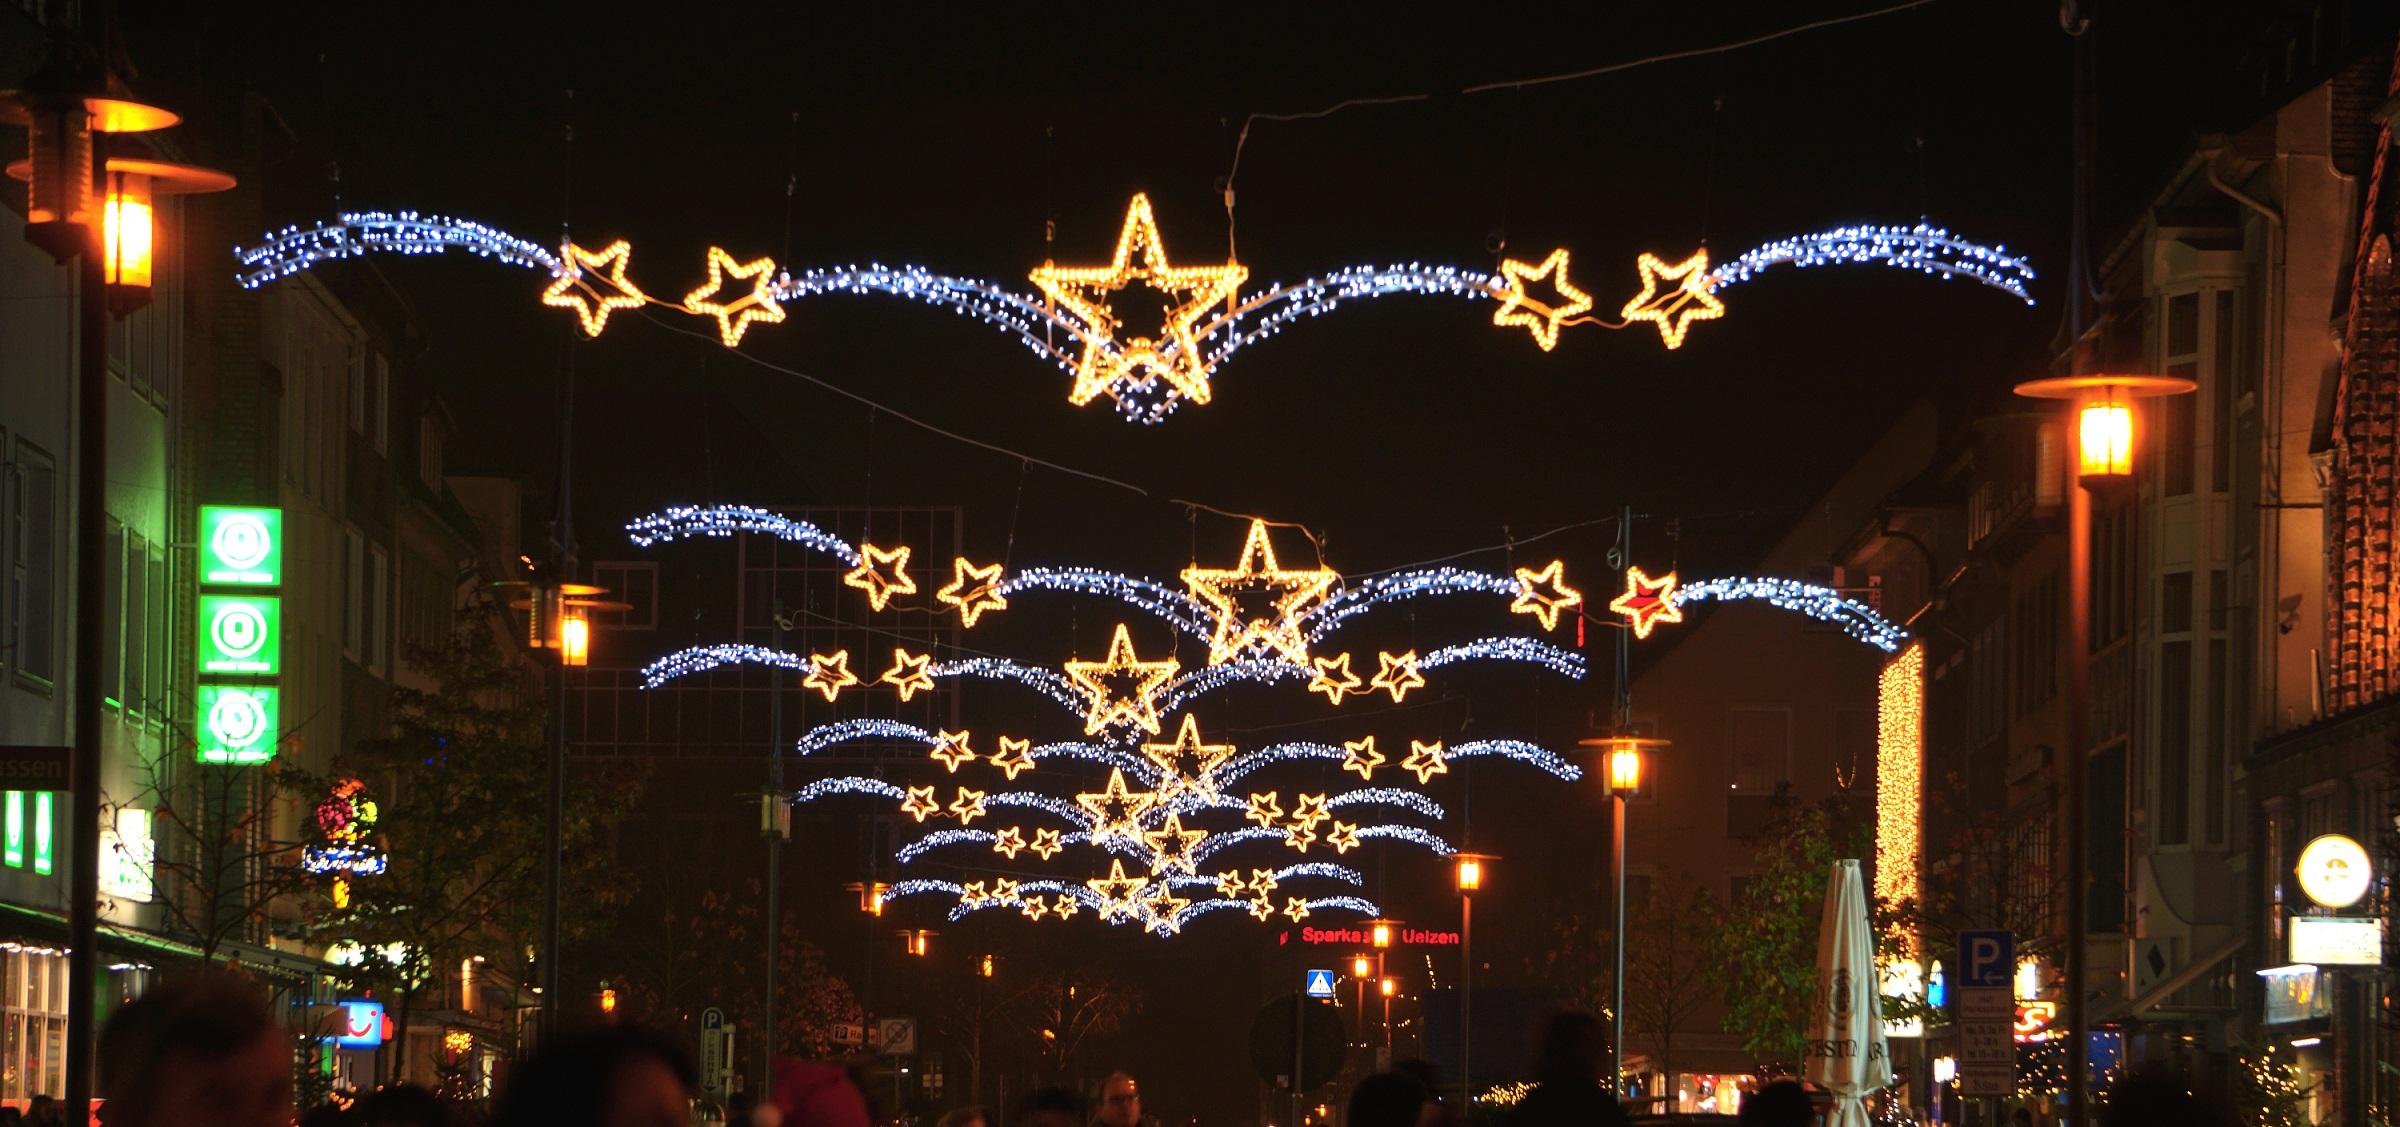 Weihnachtsbeleuchtung f r st dte my blog - Weihnachtsbeleuchtung fenster kabellos ...